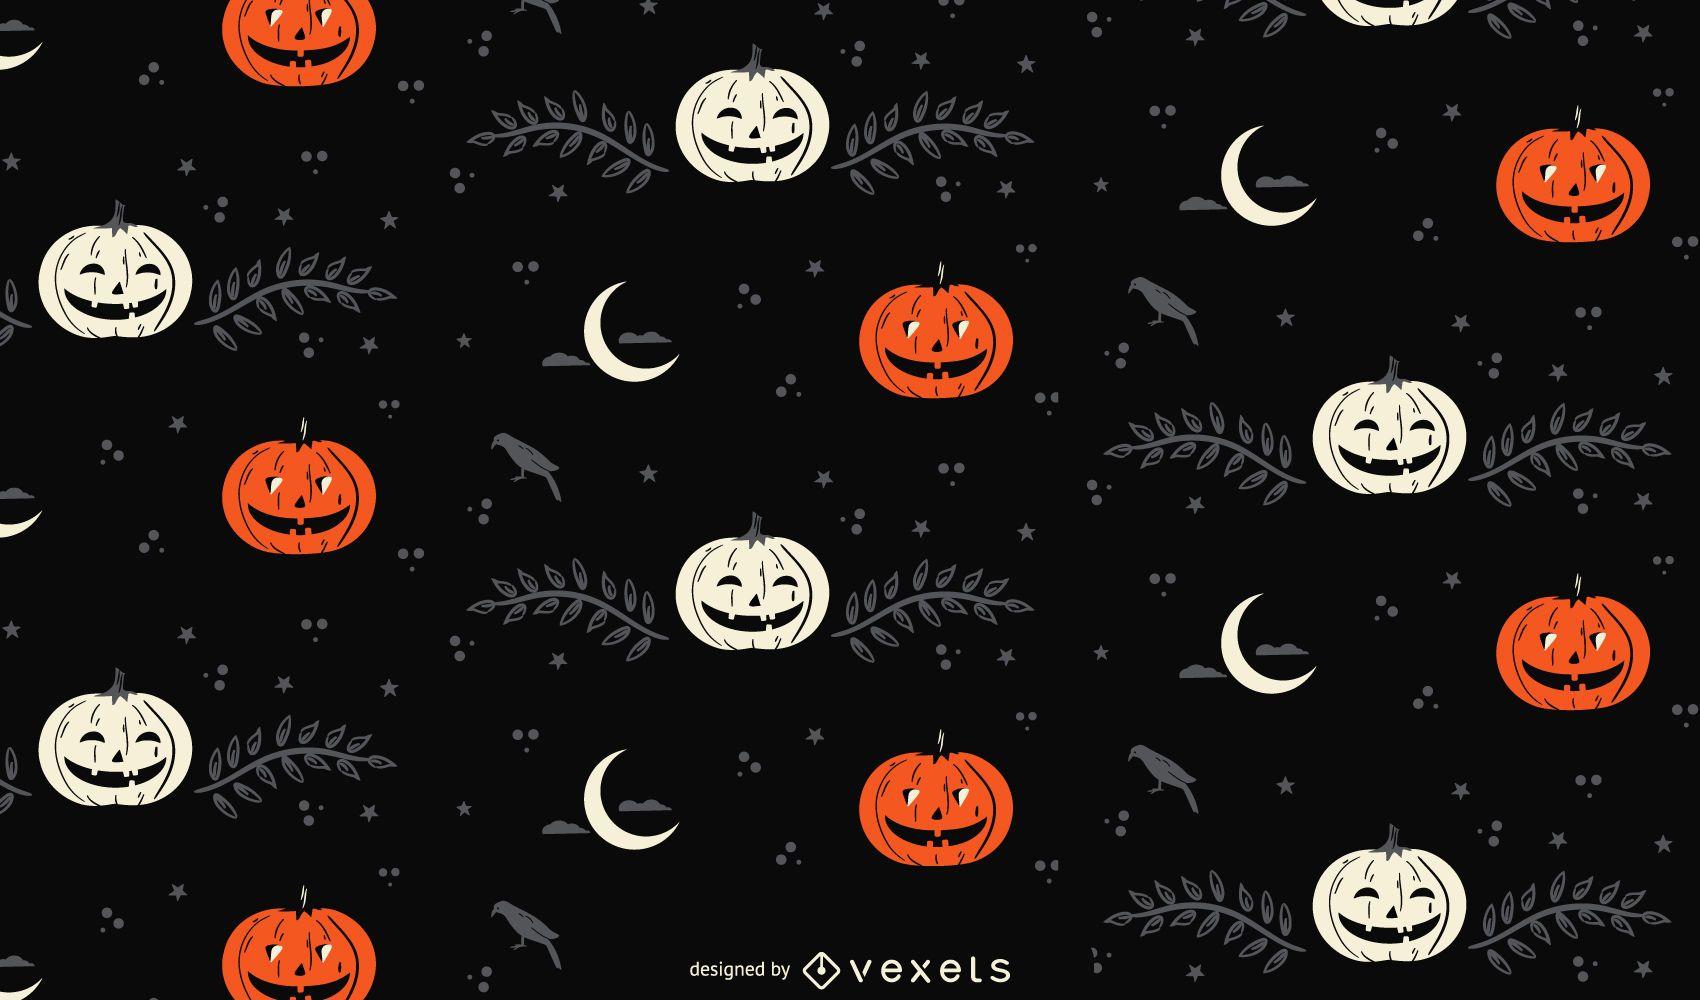 Halloween Moon and Pumpkin pattern